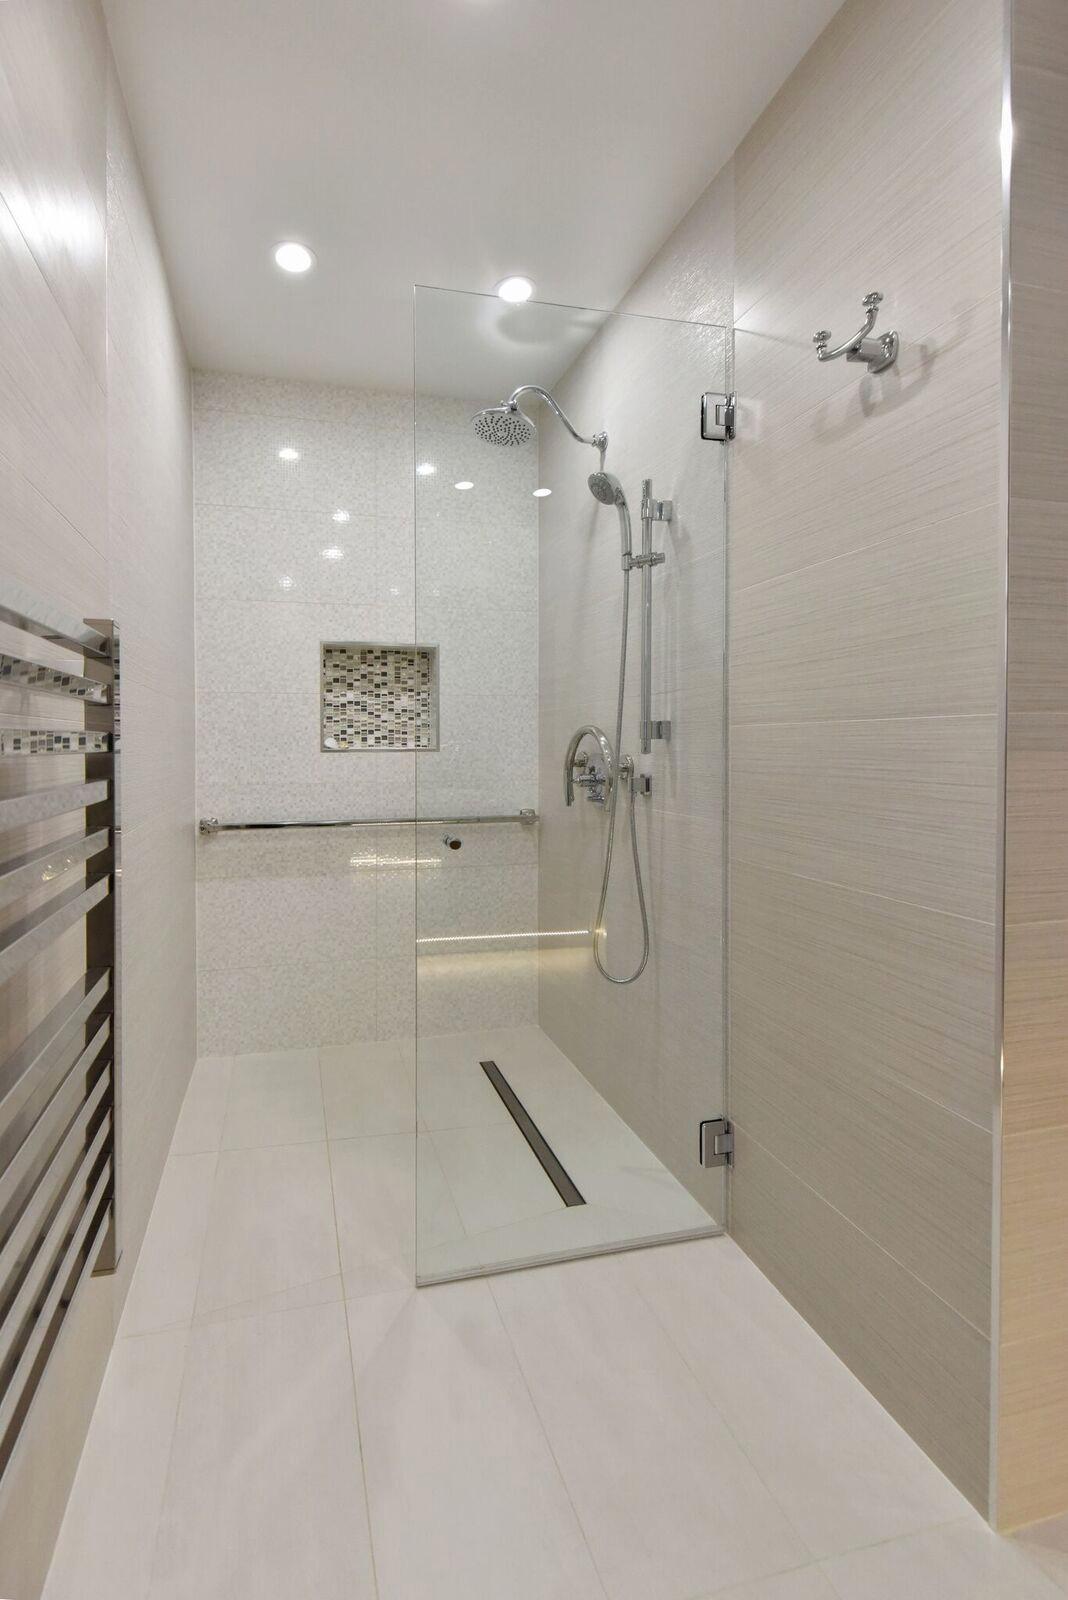 Wilson Aging in Place/Universal Design Bathroom